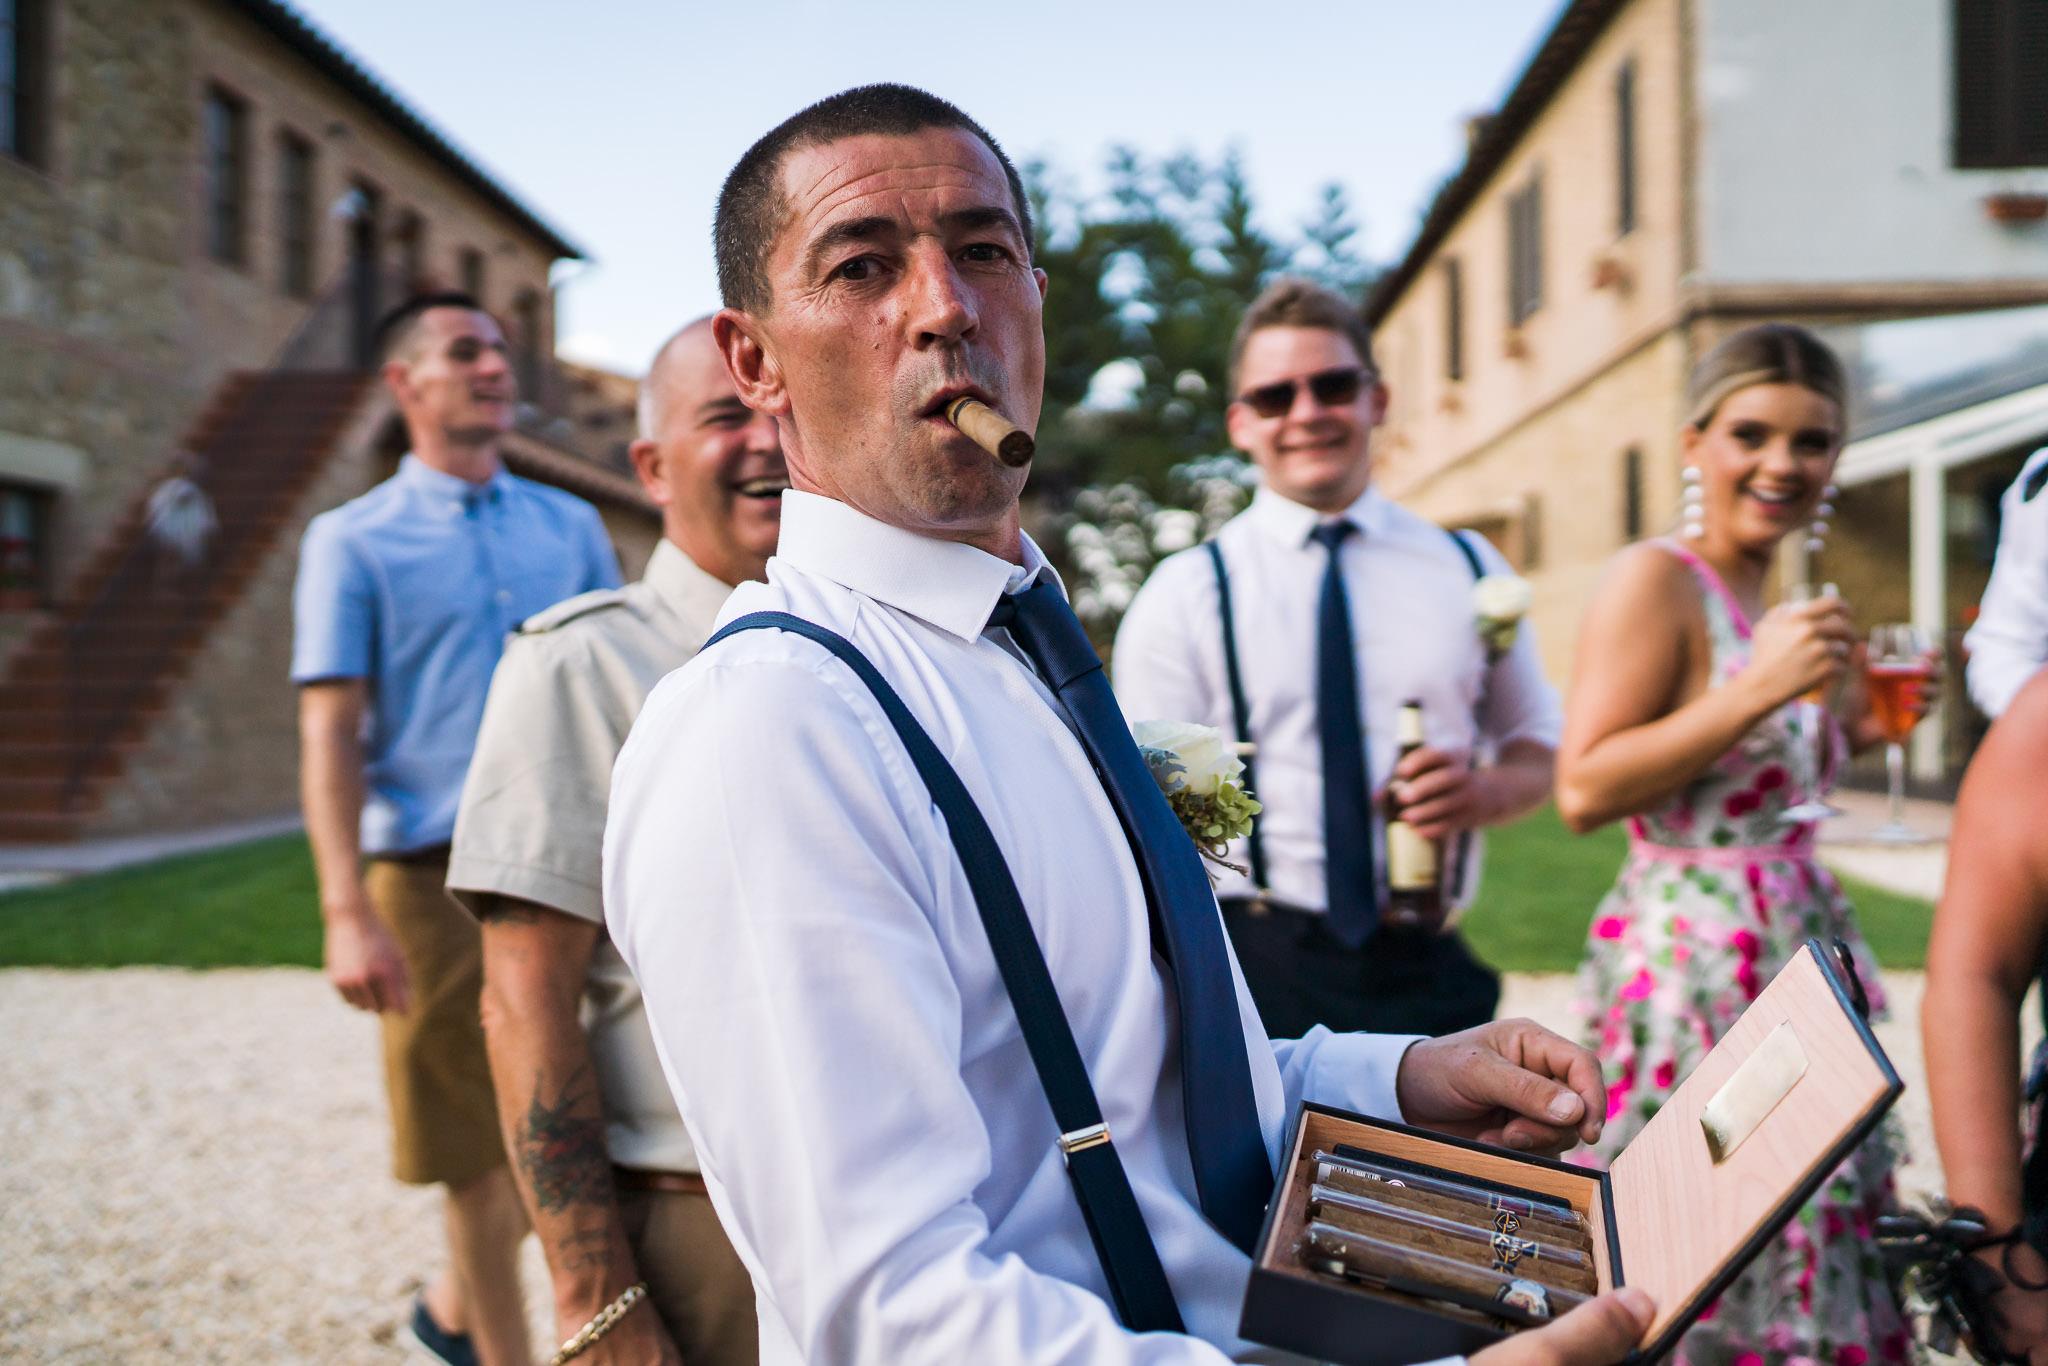 NC-2018-09-07_gemma-and-steve-wedding-3160.jpg